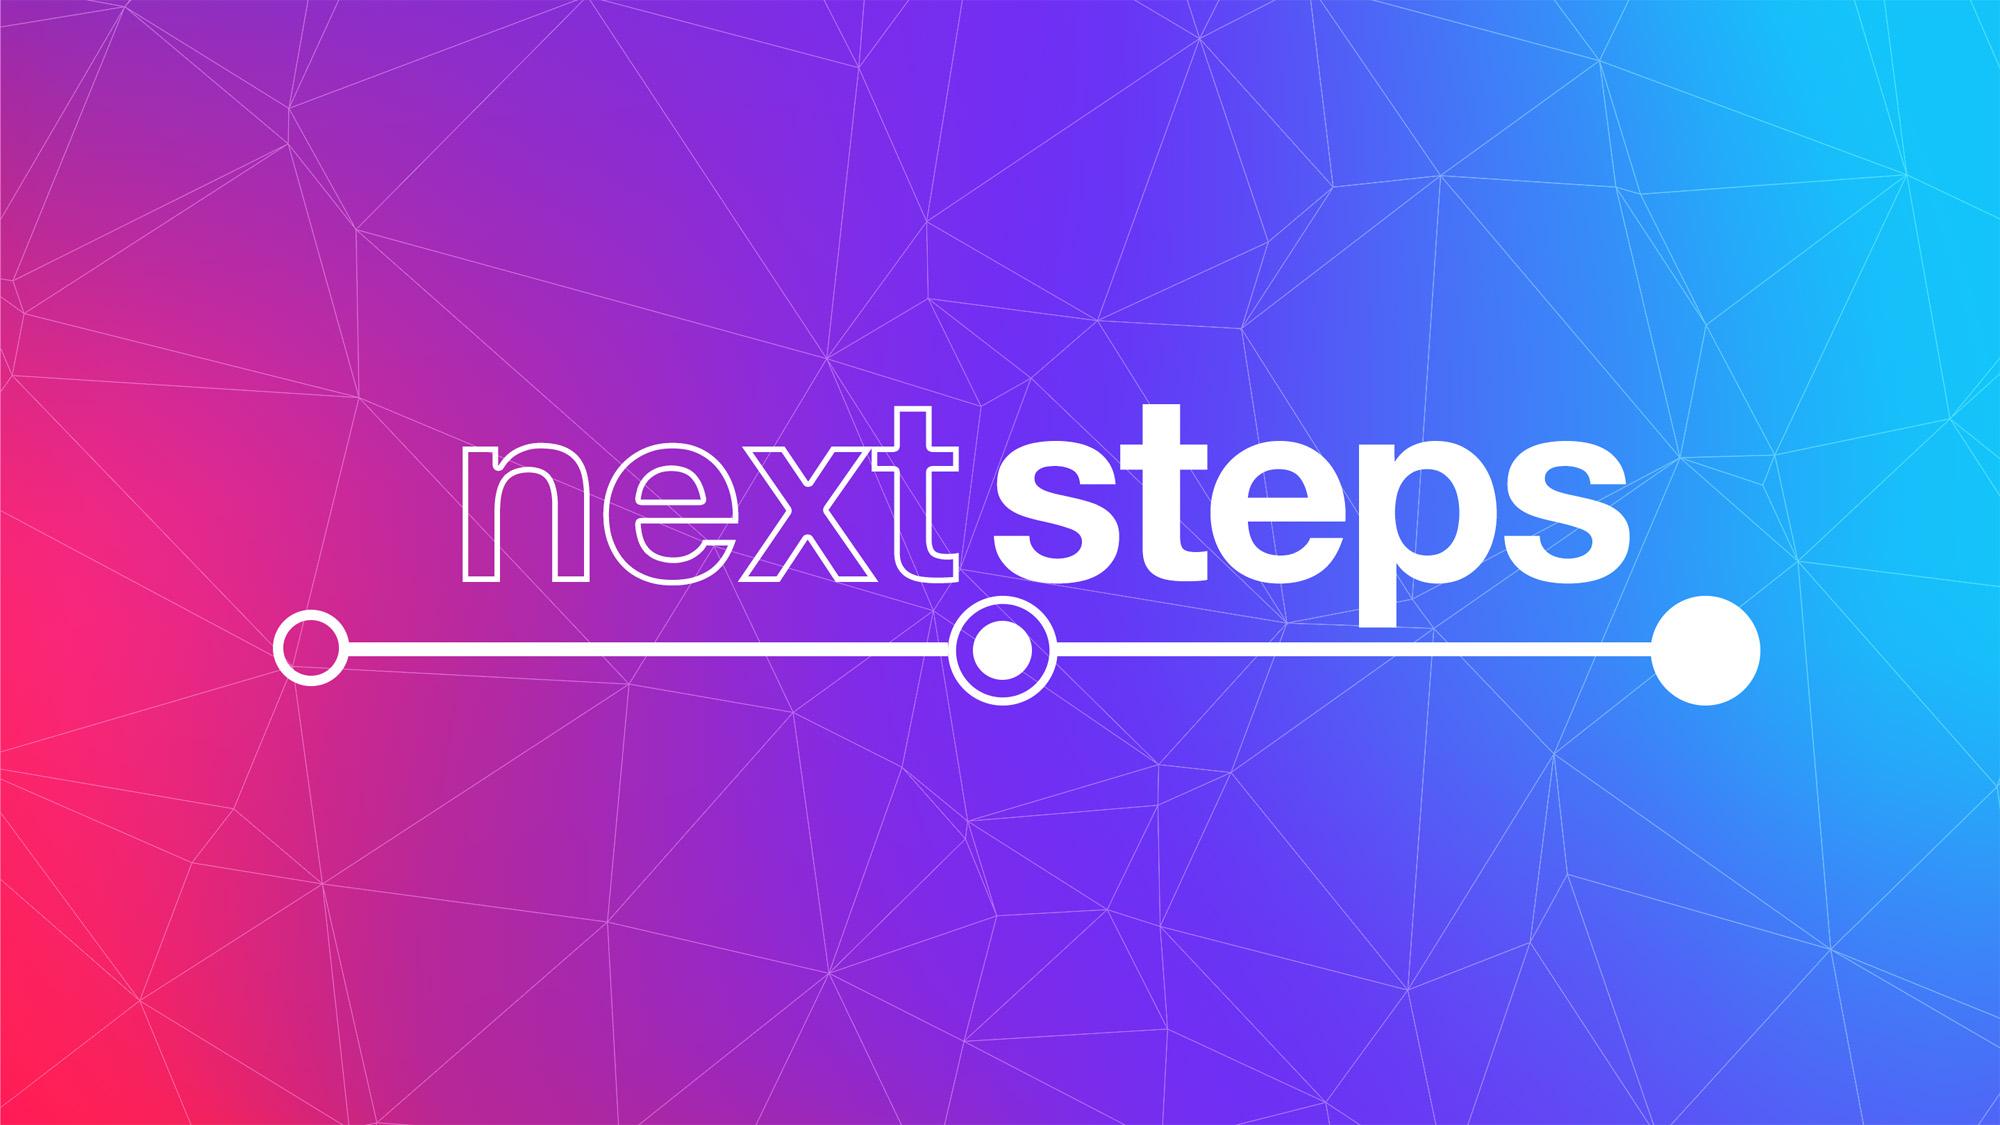 next_steps-title-1-Wide 16x9